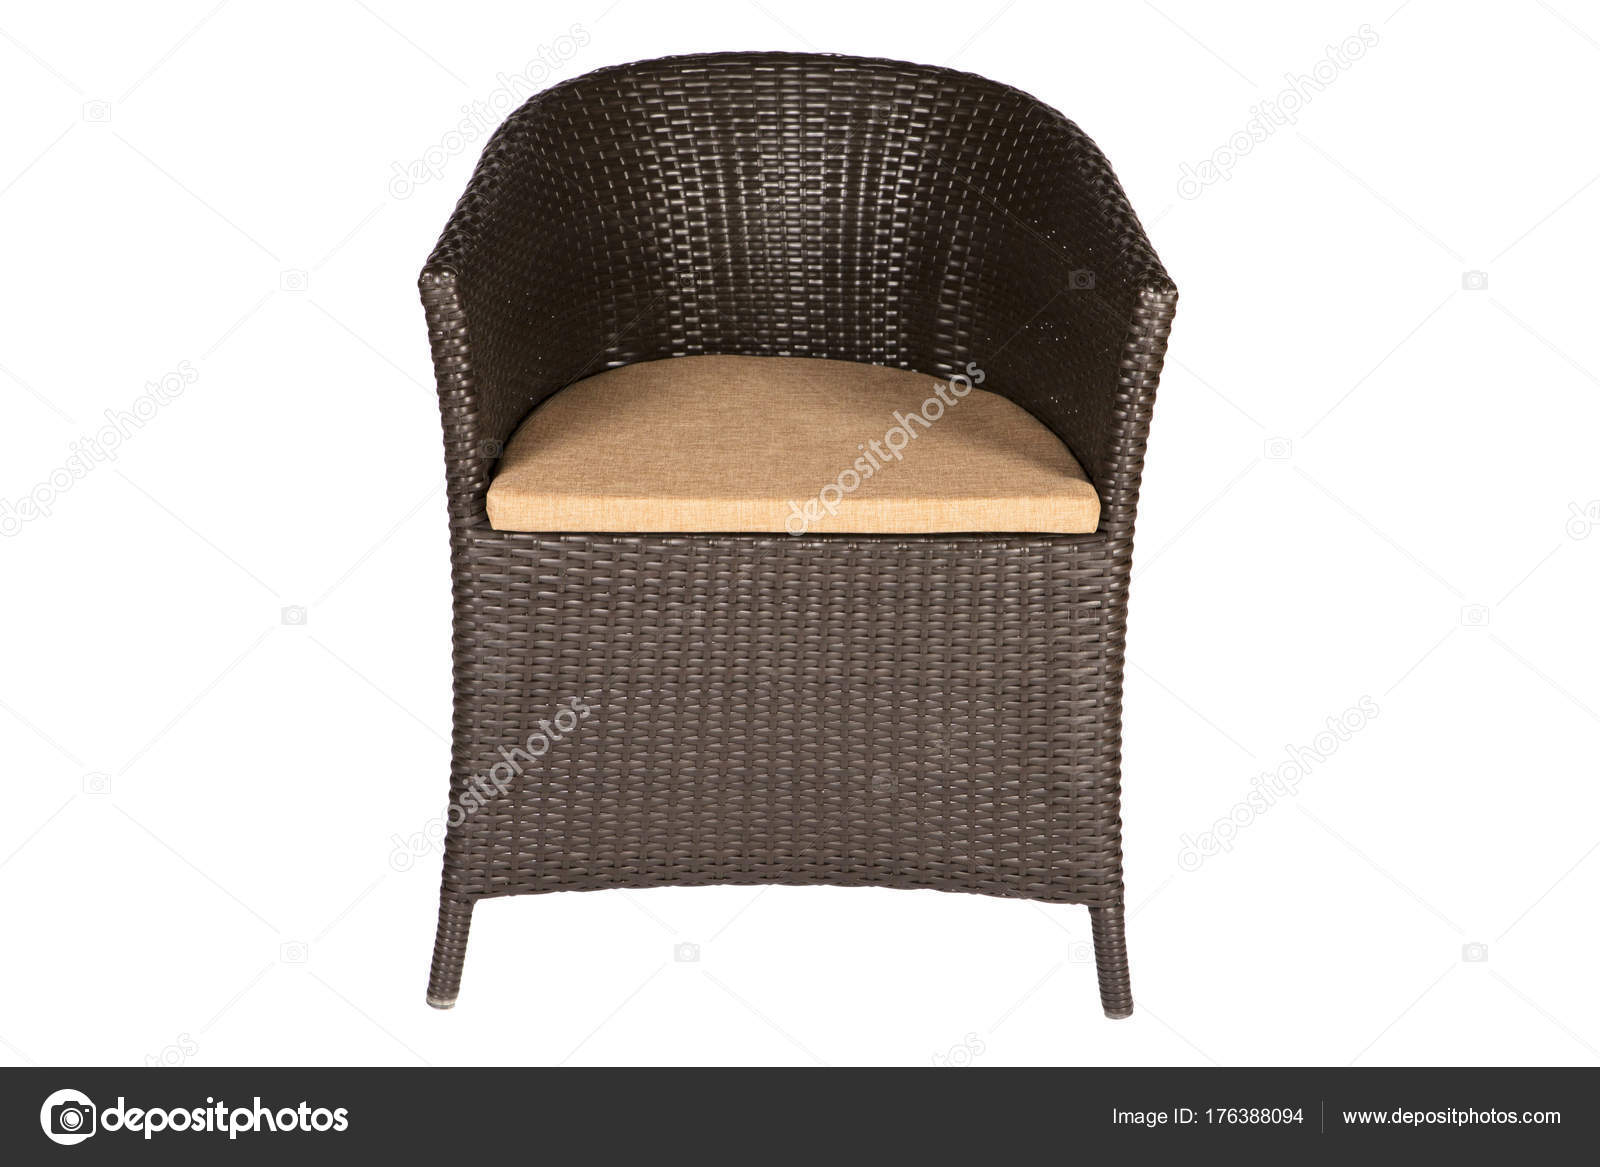 Zwarte Rieten Stoel : Rieten stoel met linnen kussens zand kleur u stockfoto thepushba